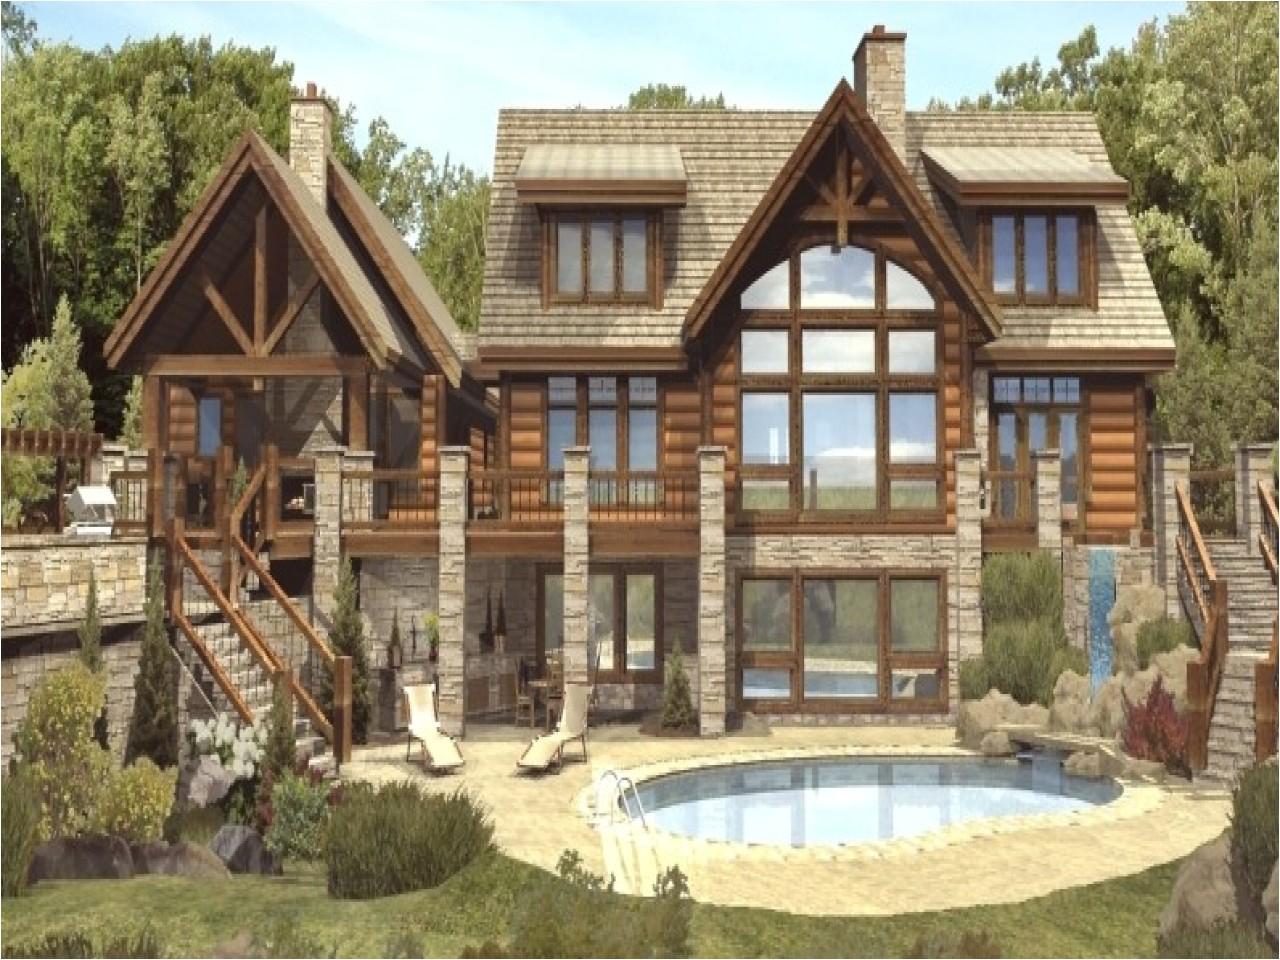 Plans for Log Cabin Homes Luxury Log Cabin Home Plans Custom Log Homes Luxury Log